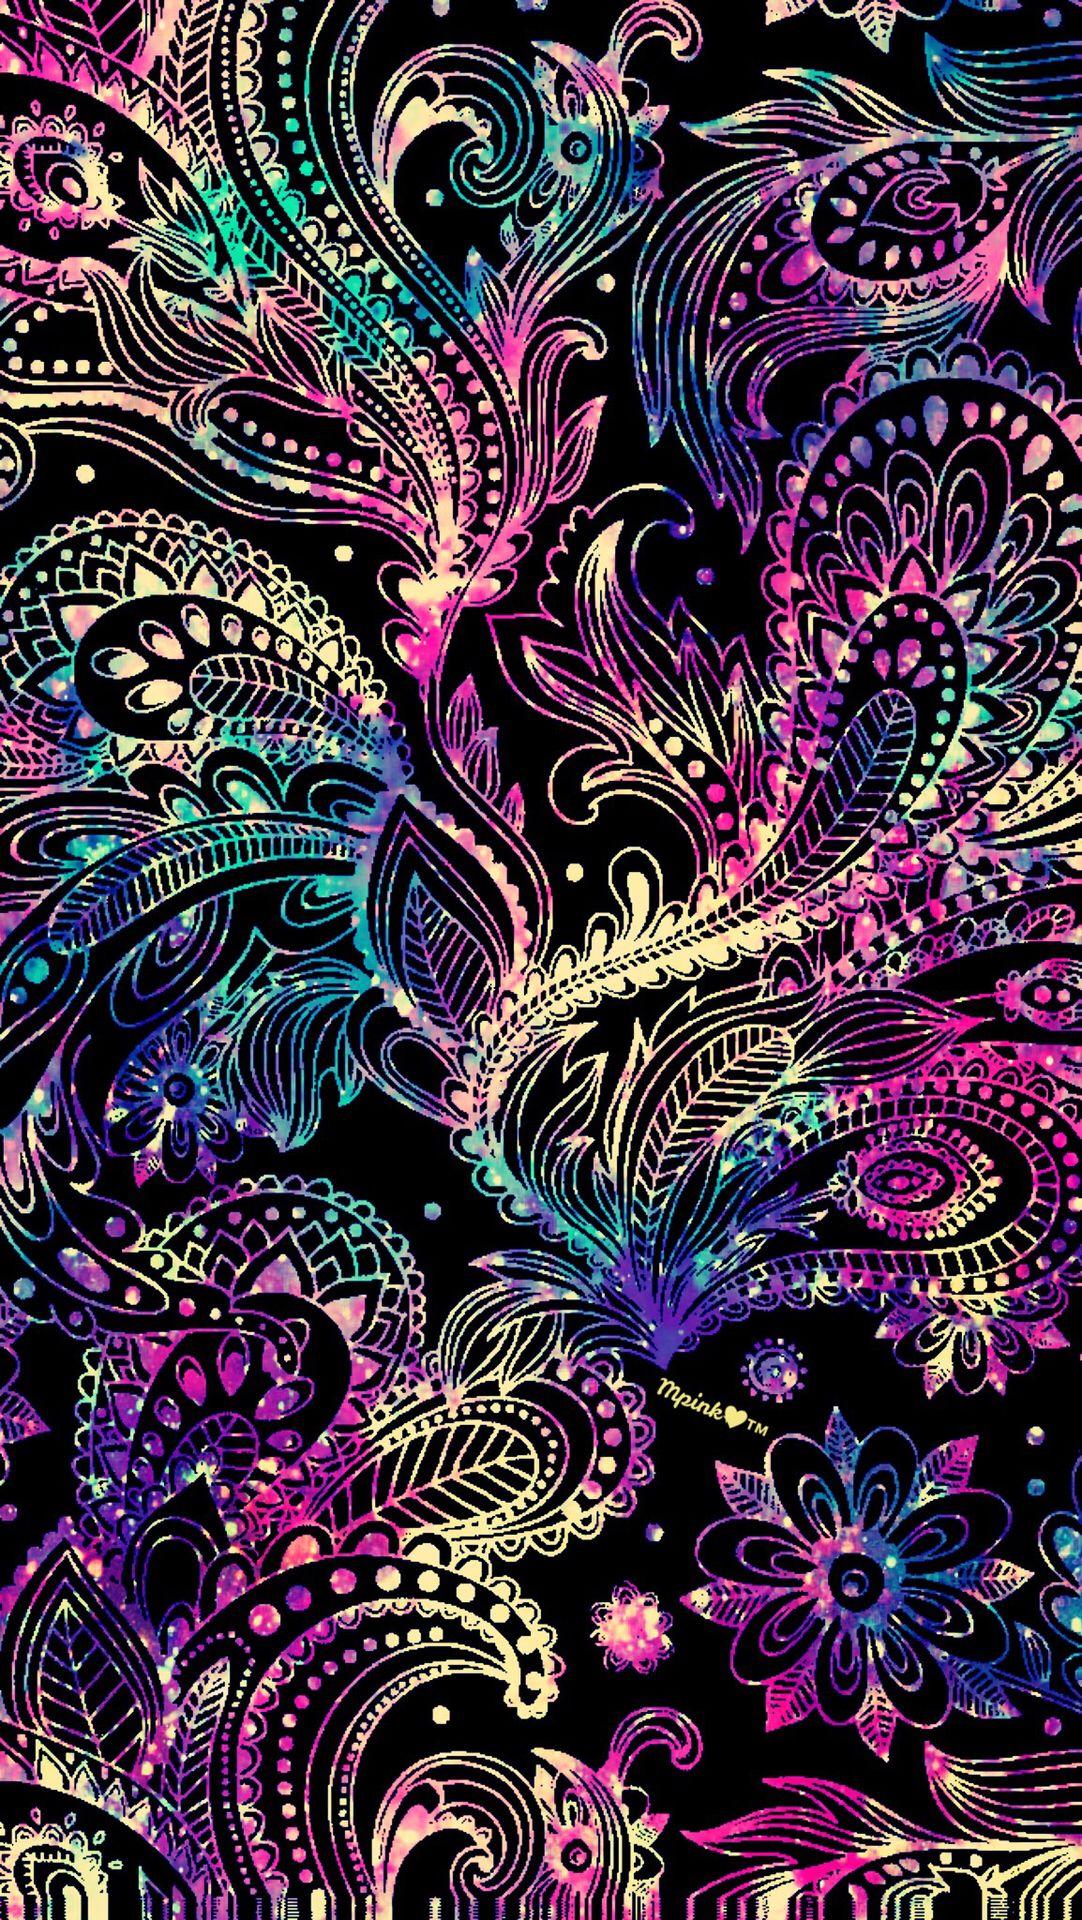 Neon Paisley Galaxy Wallpaper Androidwallpaper Iphonewallpaper Wallpaper Galaxy Sparkle Glitter Lo Galaxy Wallpaper Phone Wallpaper Beautiful Wallpapers